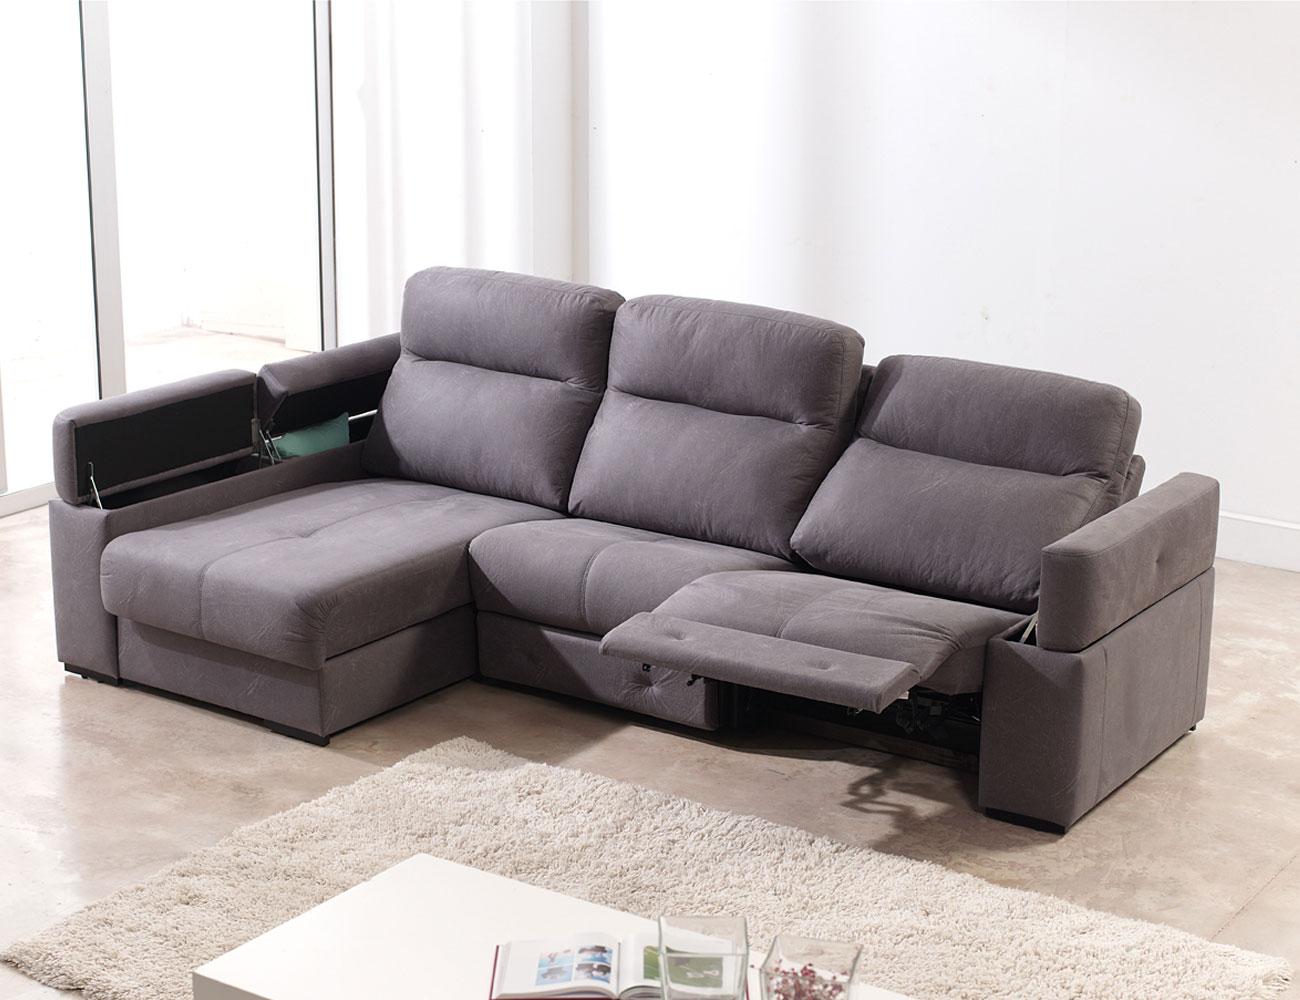 Sofa chaiselongue relax motor electrico 3 arcon 14